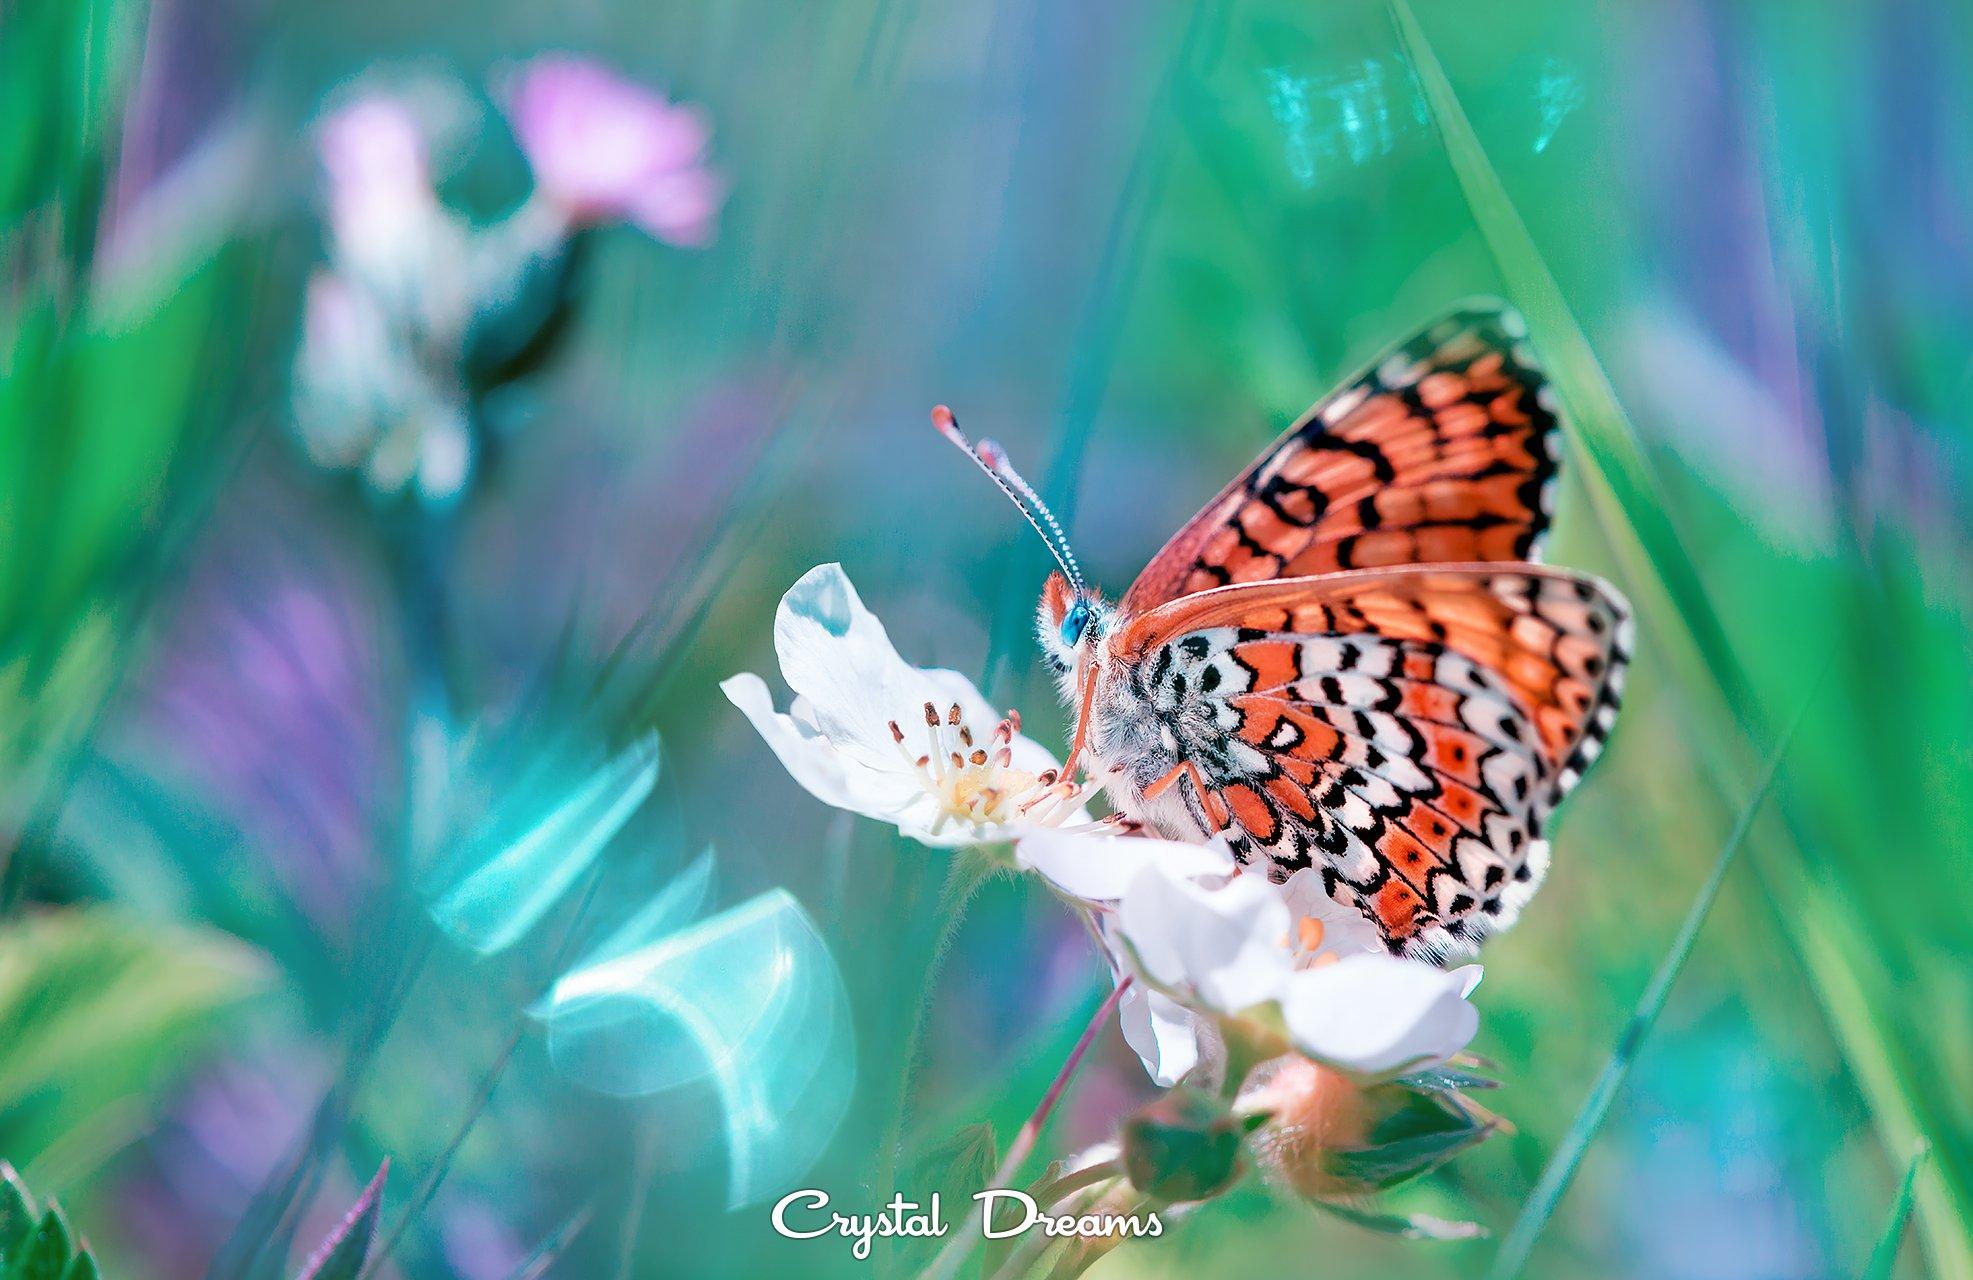 crystal dreams, macro, summer, color, art, nature, butterfly, бабочка, лето, волшебство, Крылова Татьяна